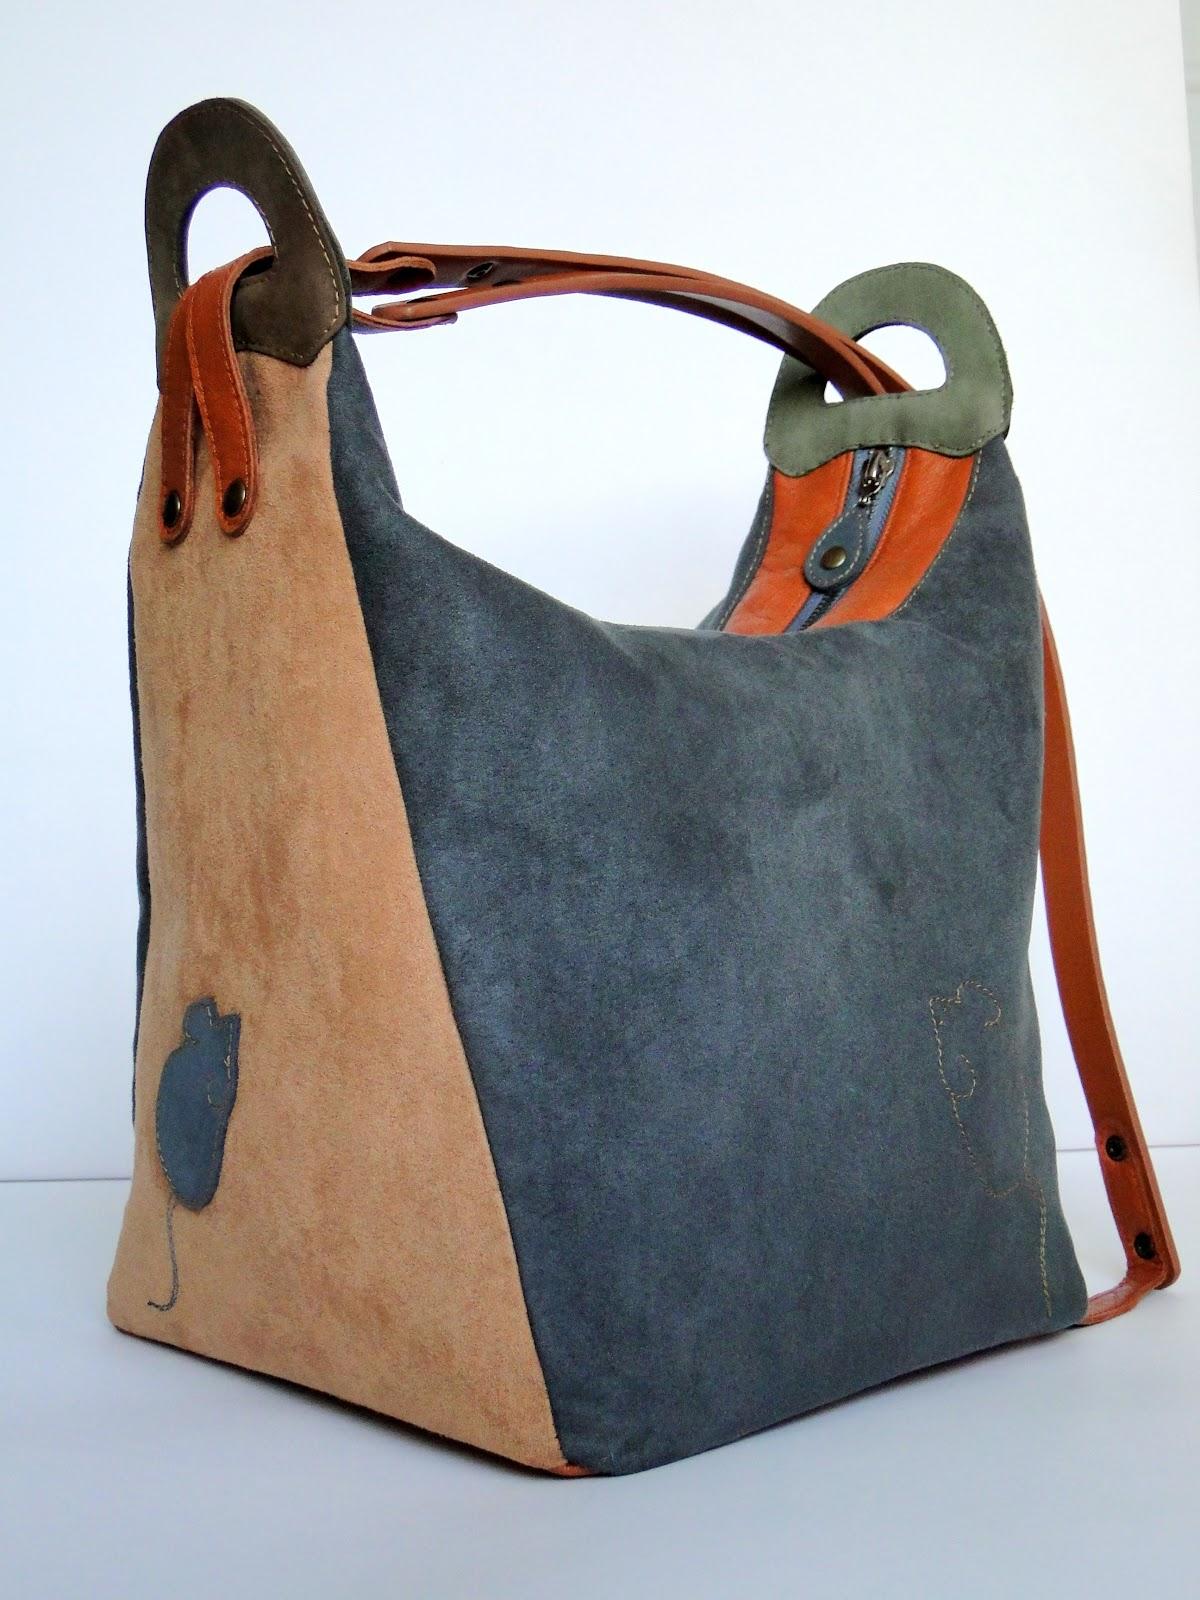 Сумки рюкзаки своими руками